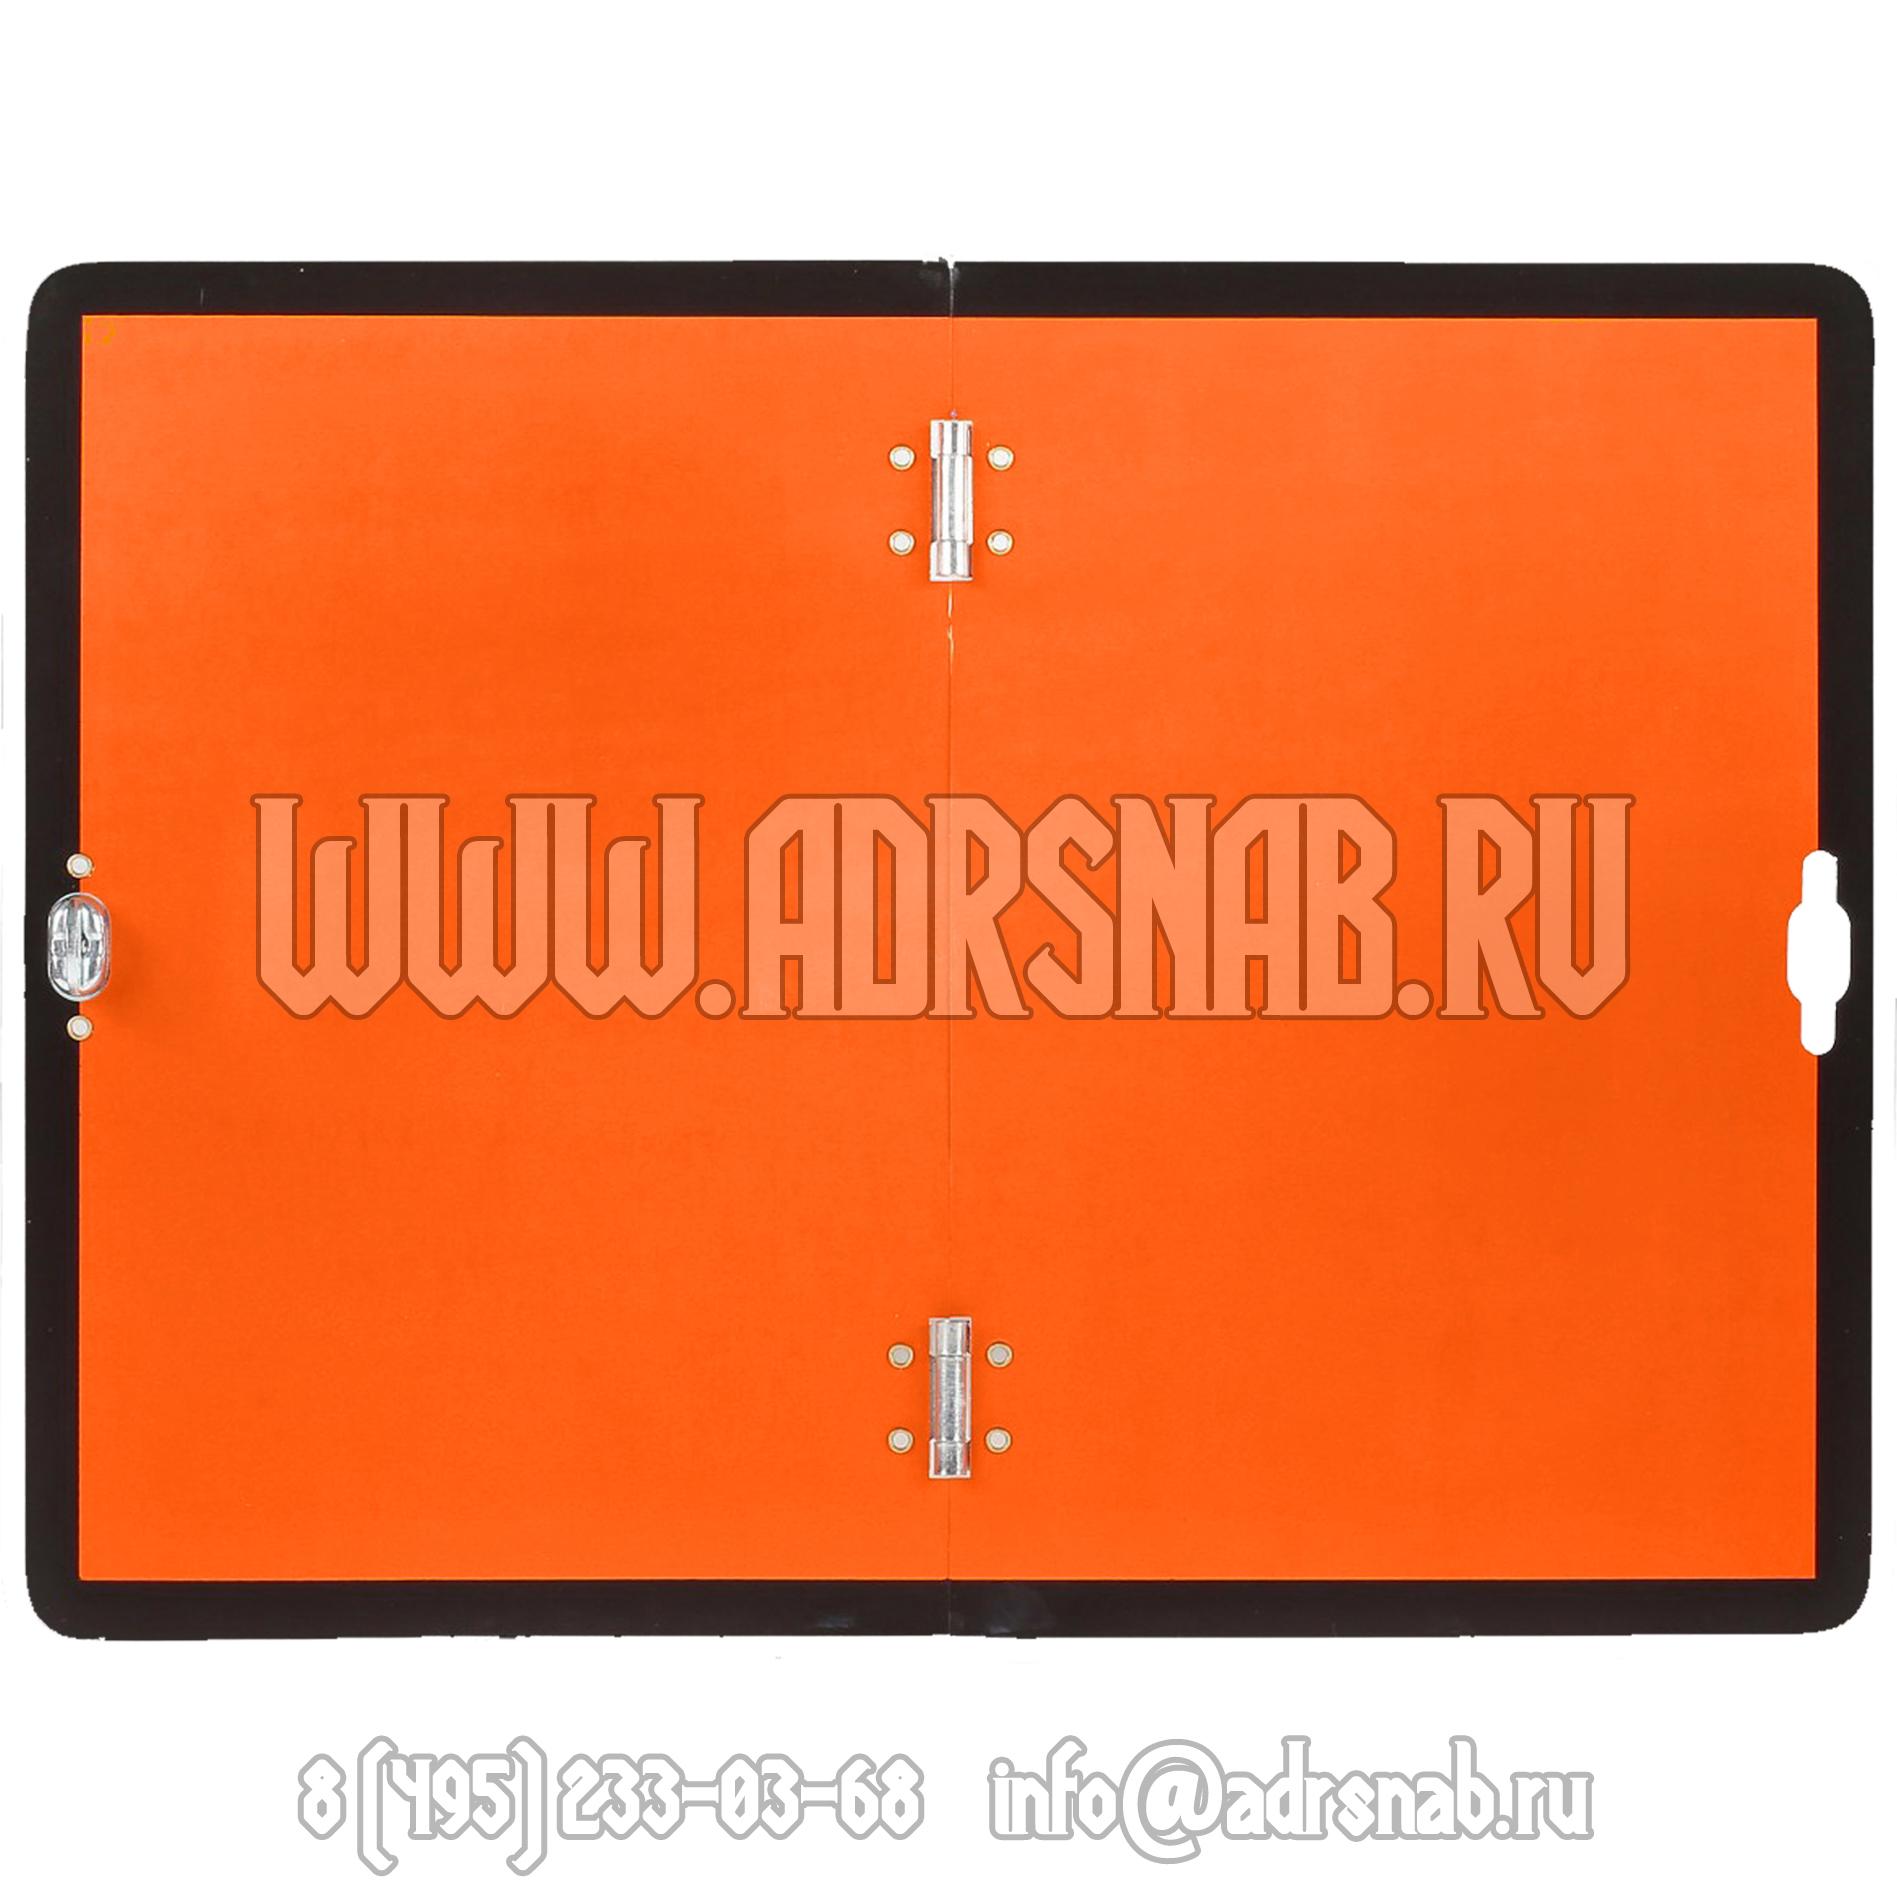 Табличка оранжевая нейтральная, складная